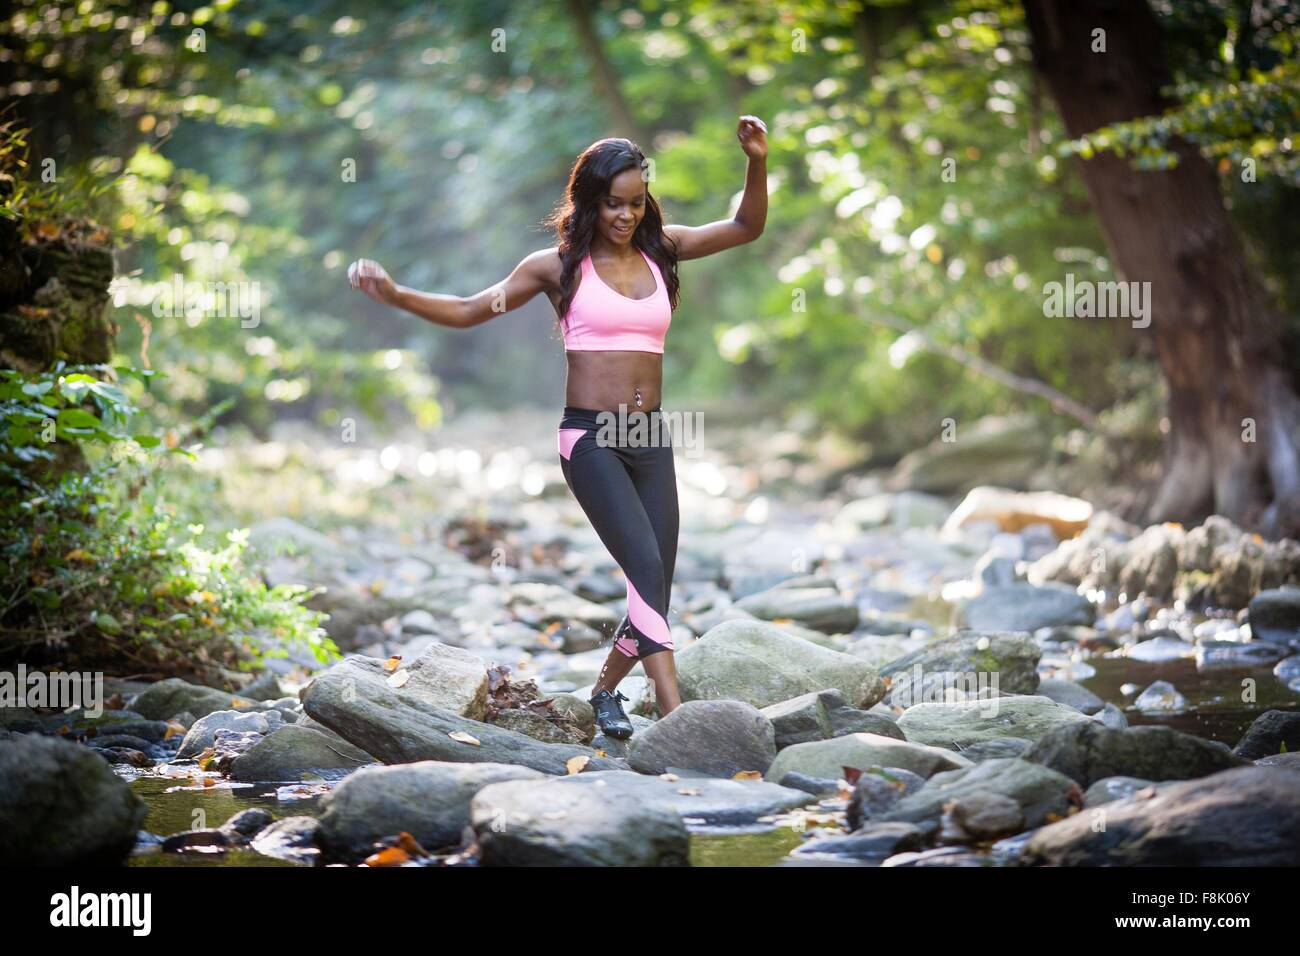 Young female hiker enjambant la rivière forêt rocks Photo Stock